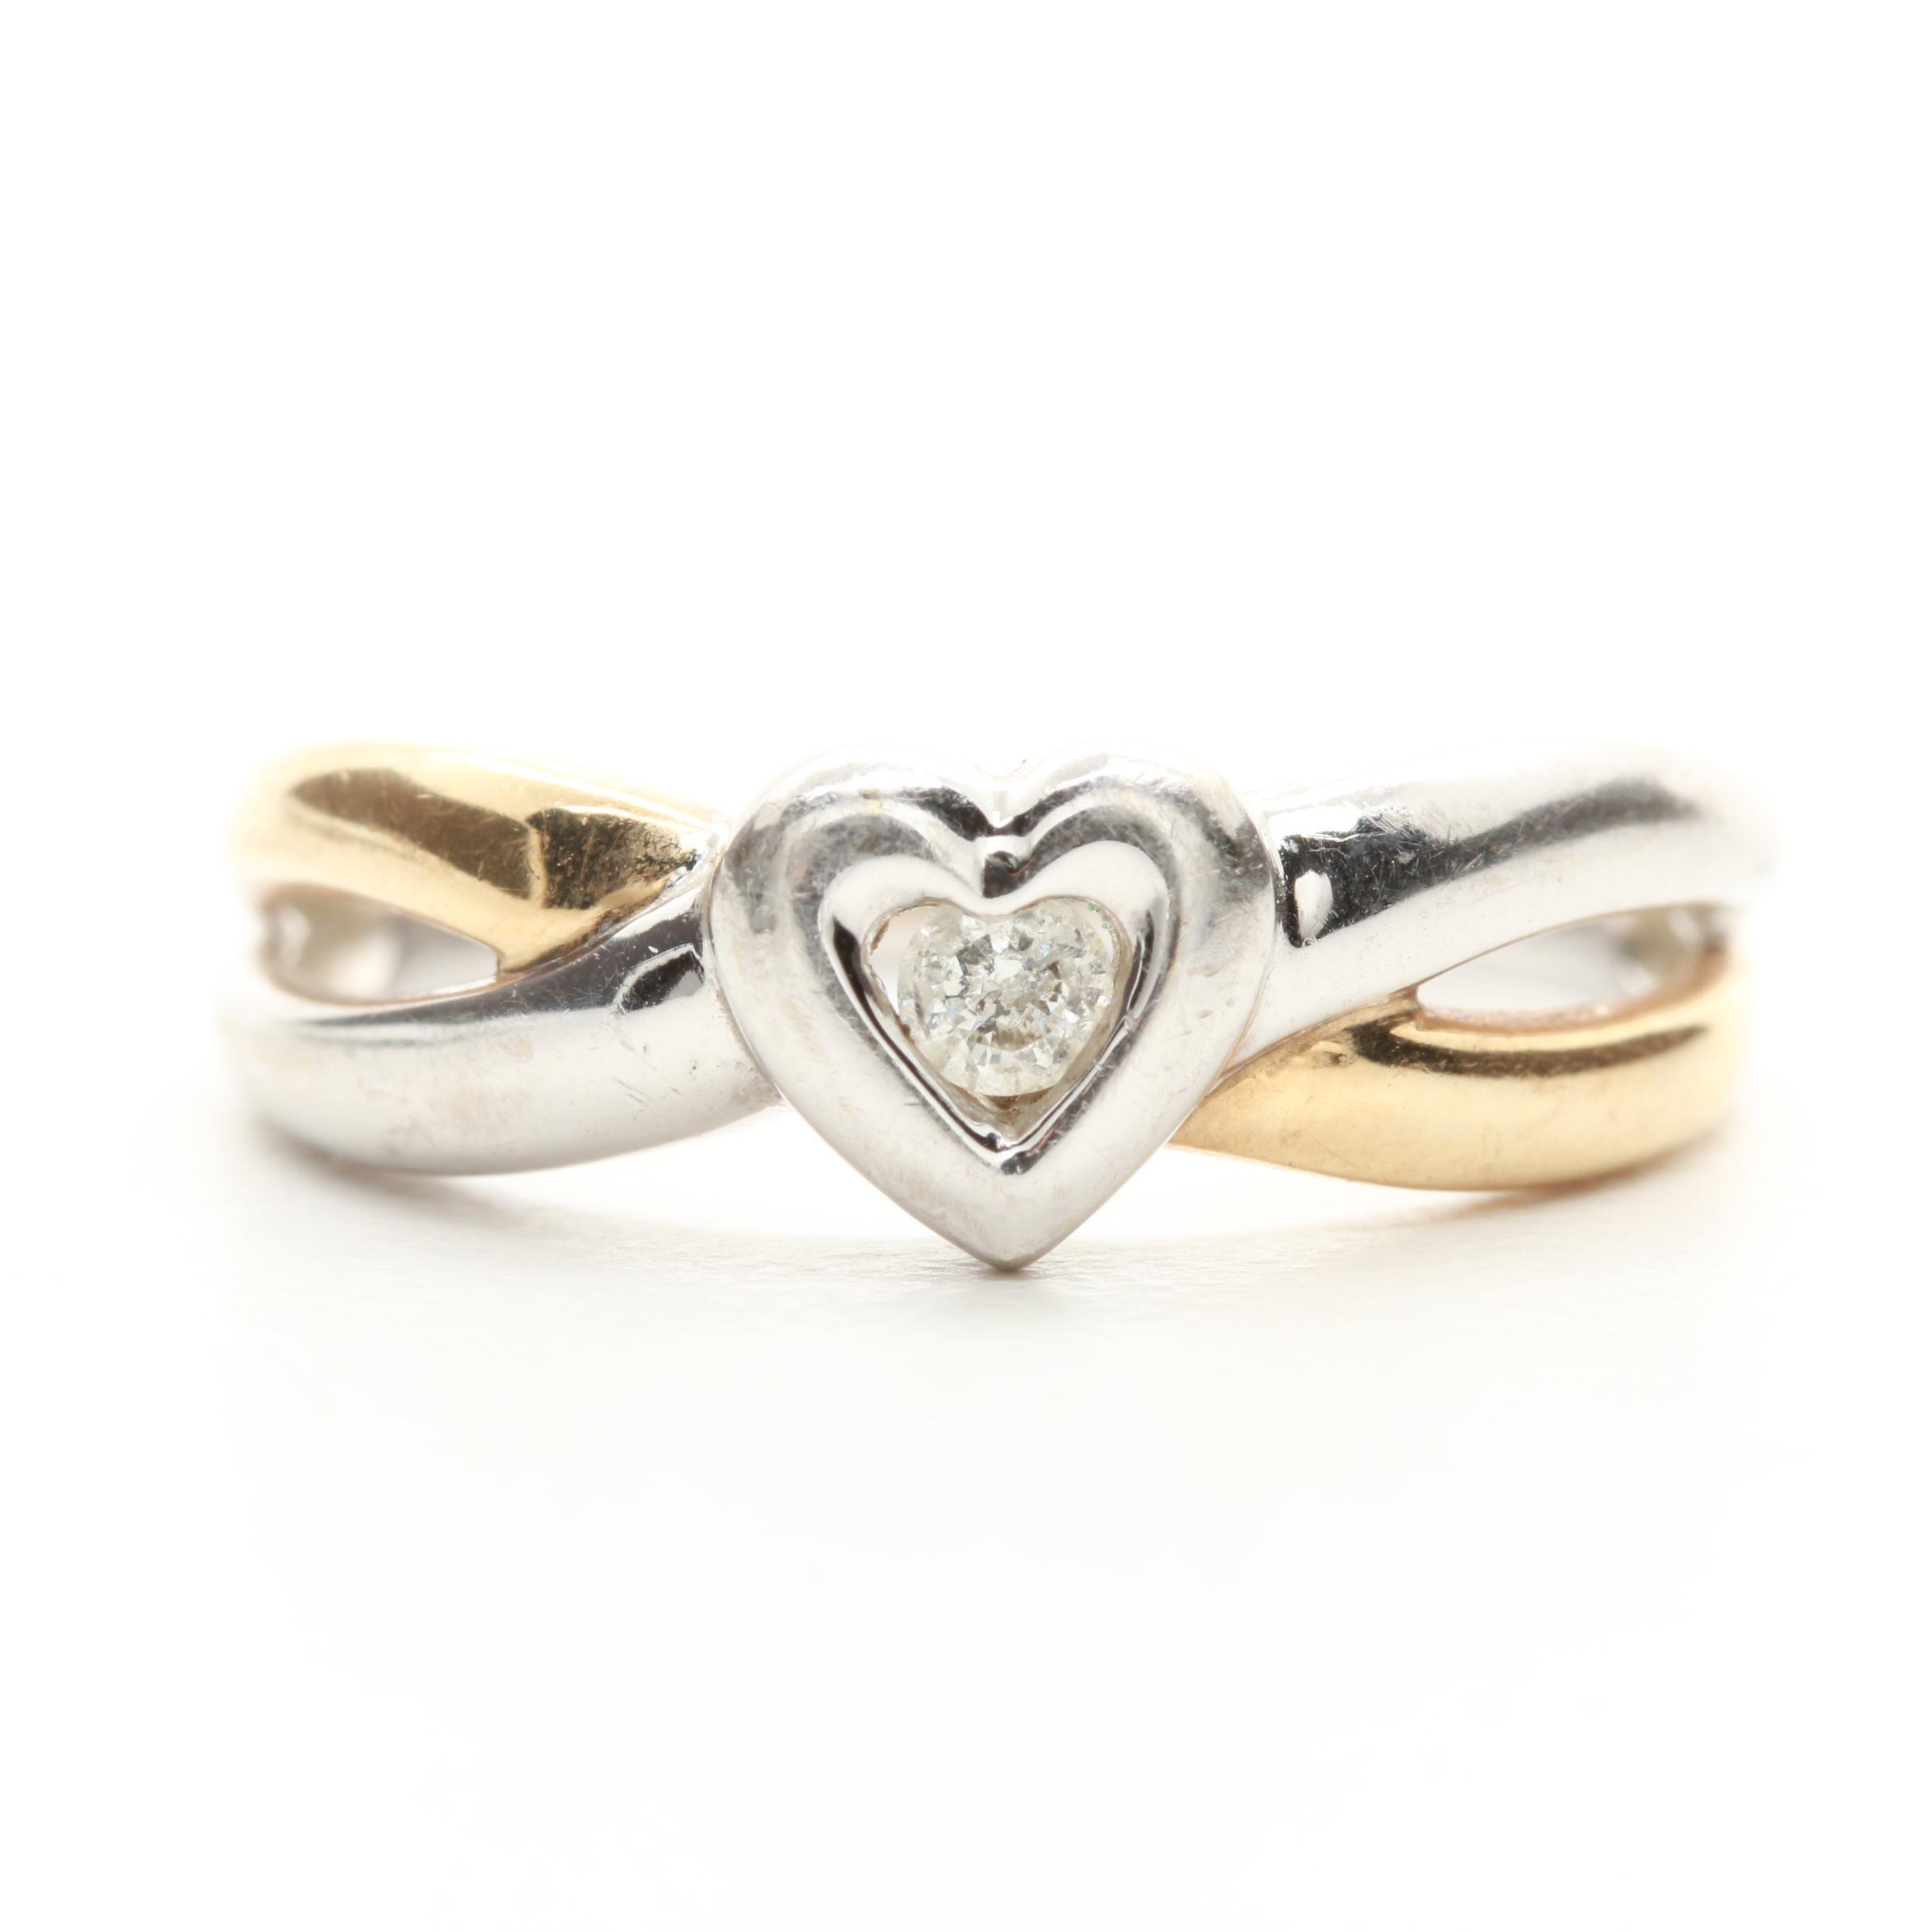 10K White and Yellow Gold Diamond Heart Ring